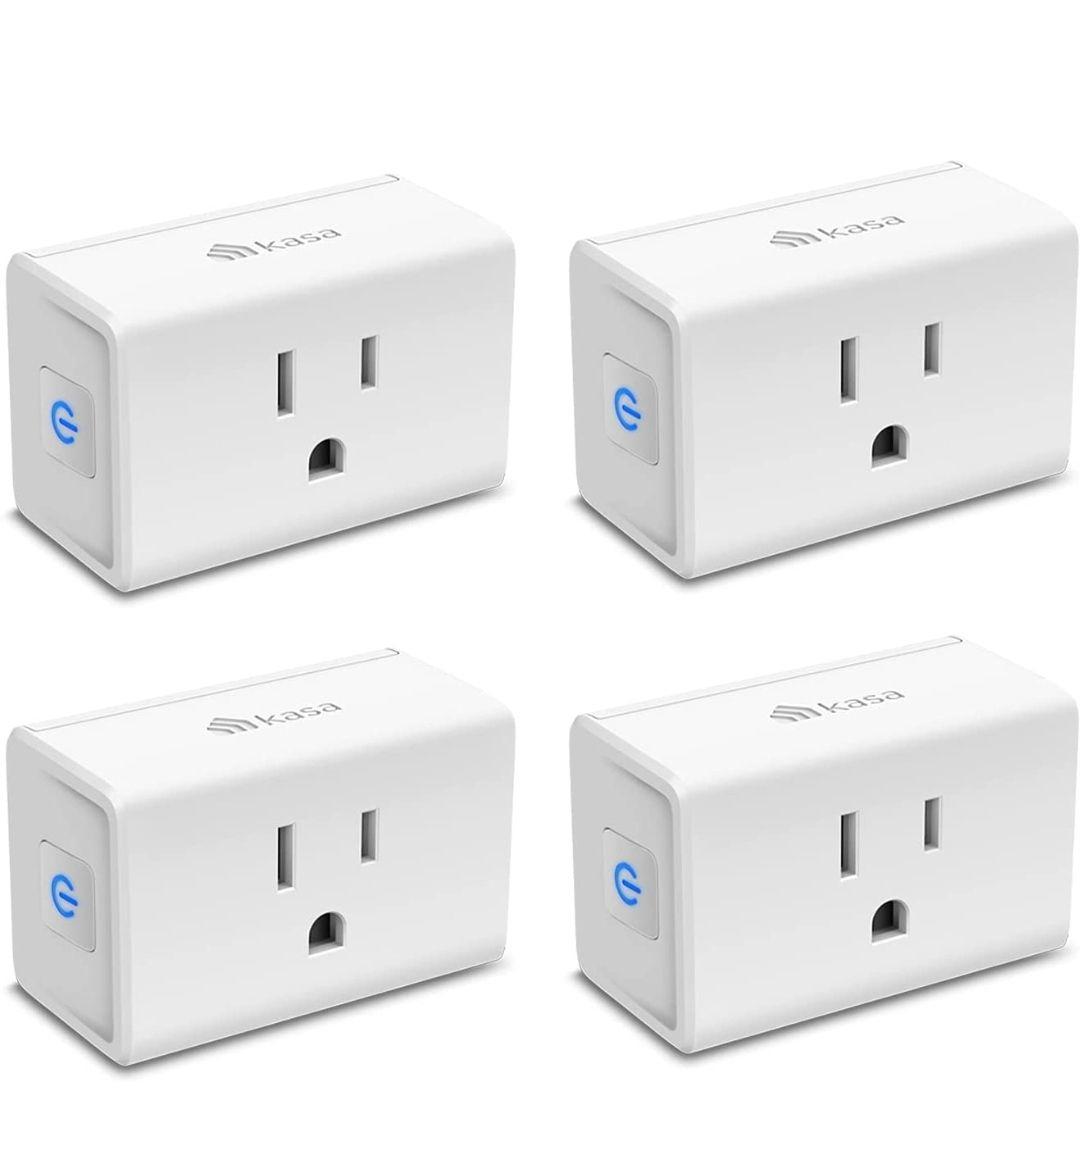 Amazon Smart Plug Mini Kasa TP-Link 4 Pack